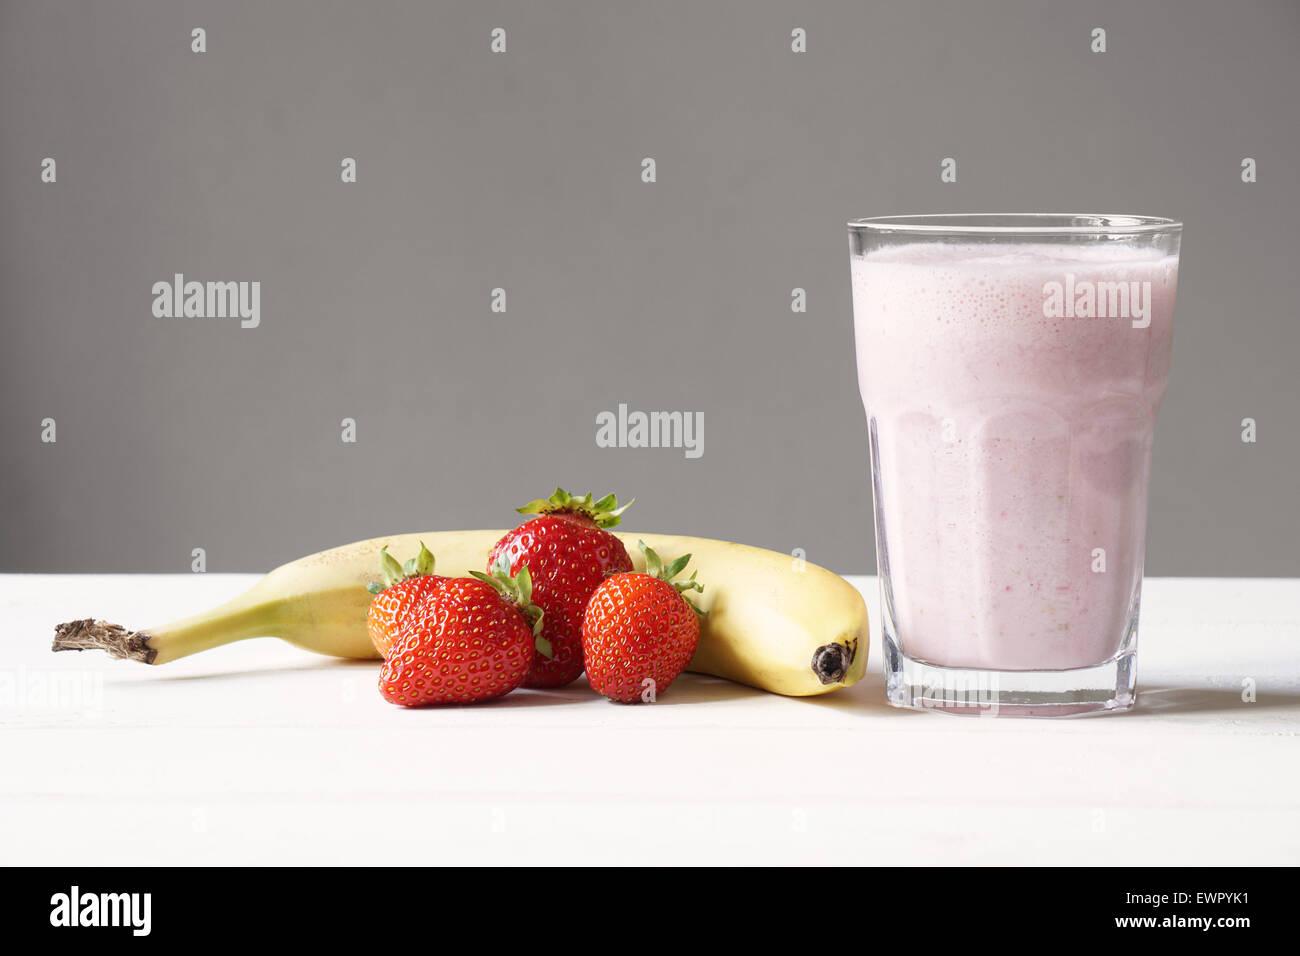 strawberry banana smoothie - Stock Image